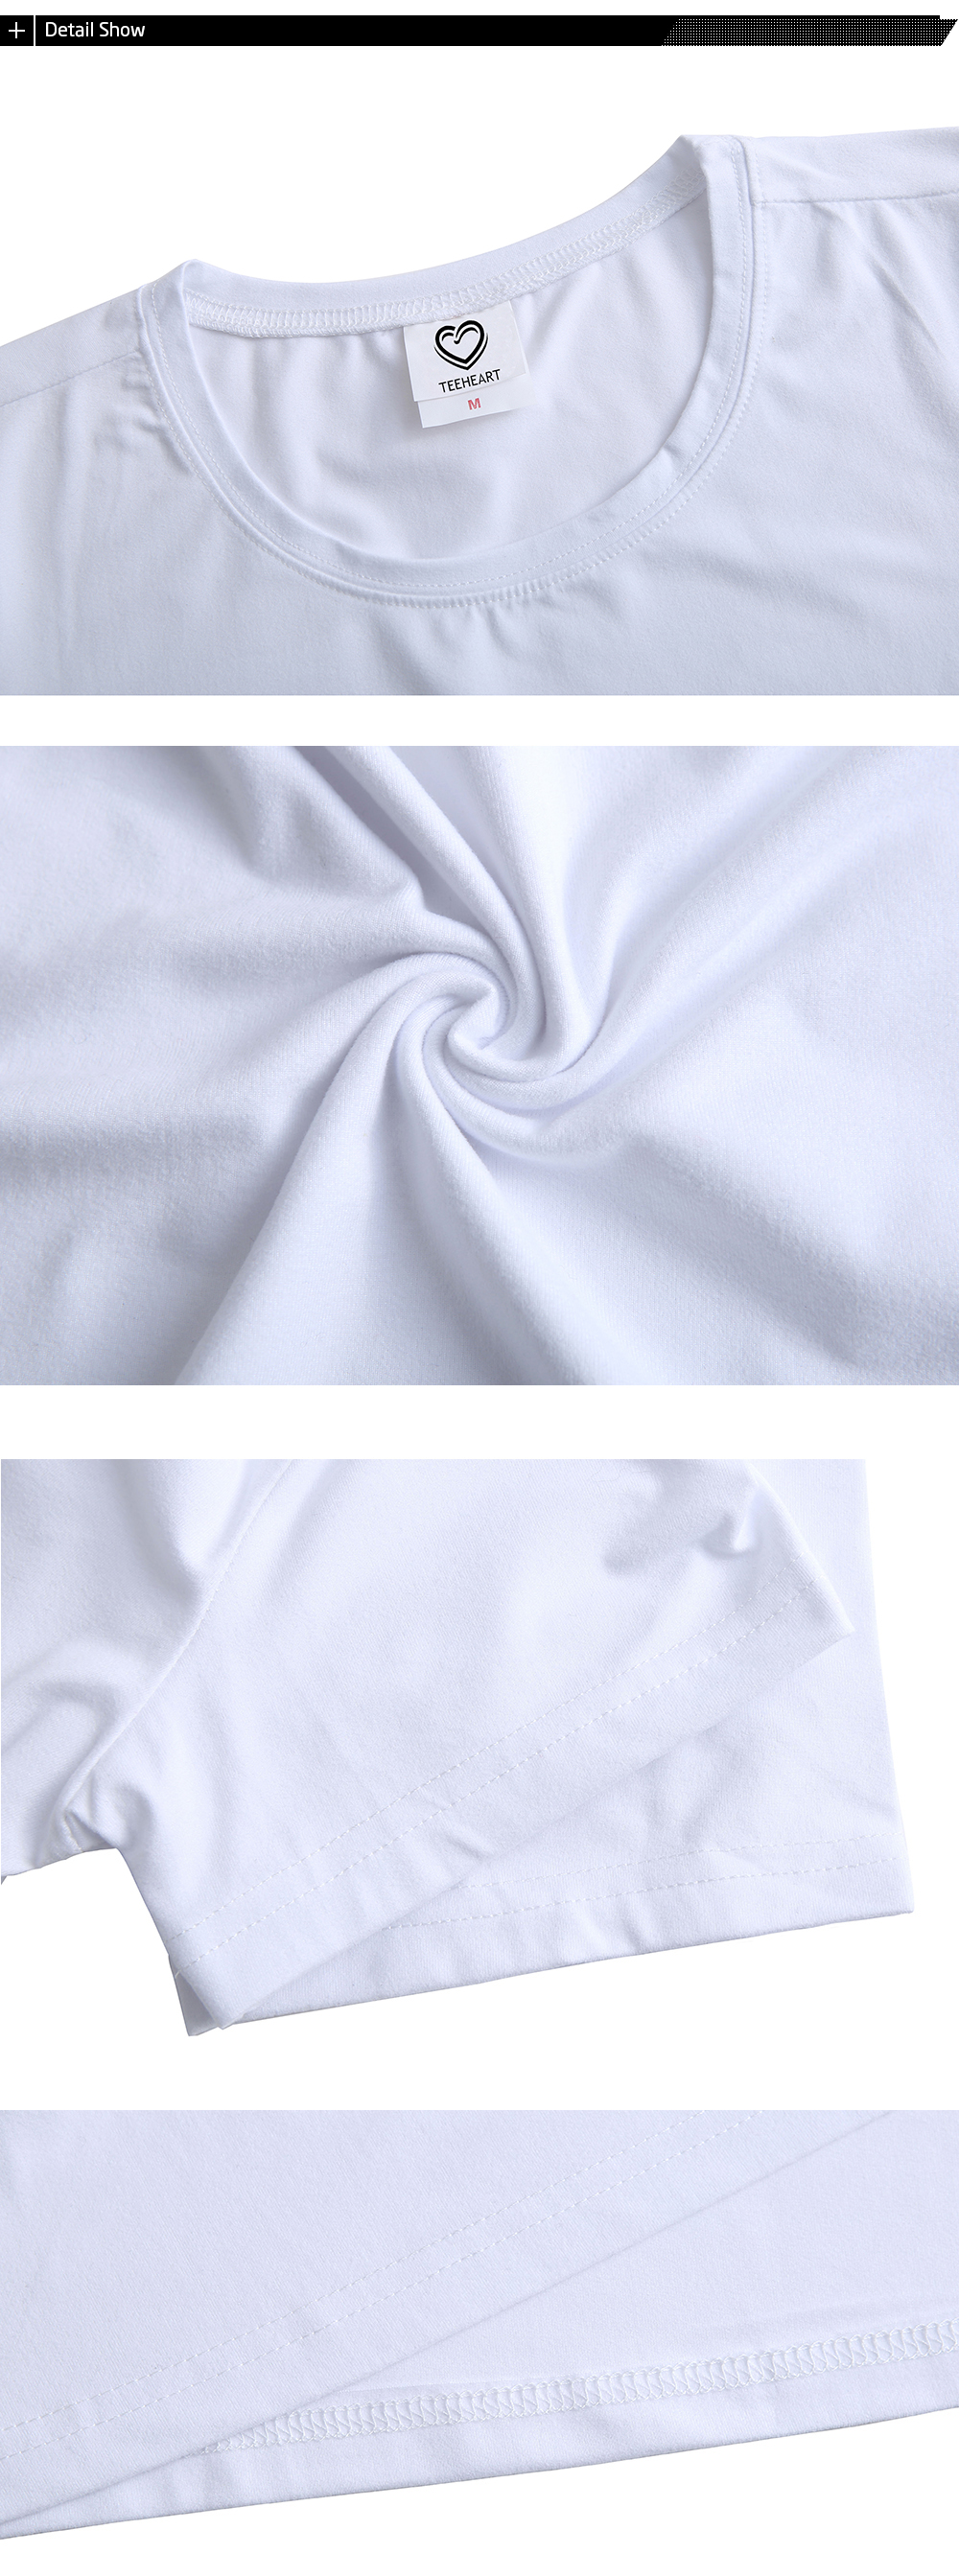 HTB1o12YQpXXXXa0aXXXq6xXFXXXw - Dabbing Unicorn t-shirt Female 2017 Spring Summer Woman Fashion Tops Ladies Tee Shirts Casual Short Sleeve T-shirt Tops Tees